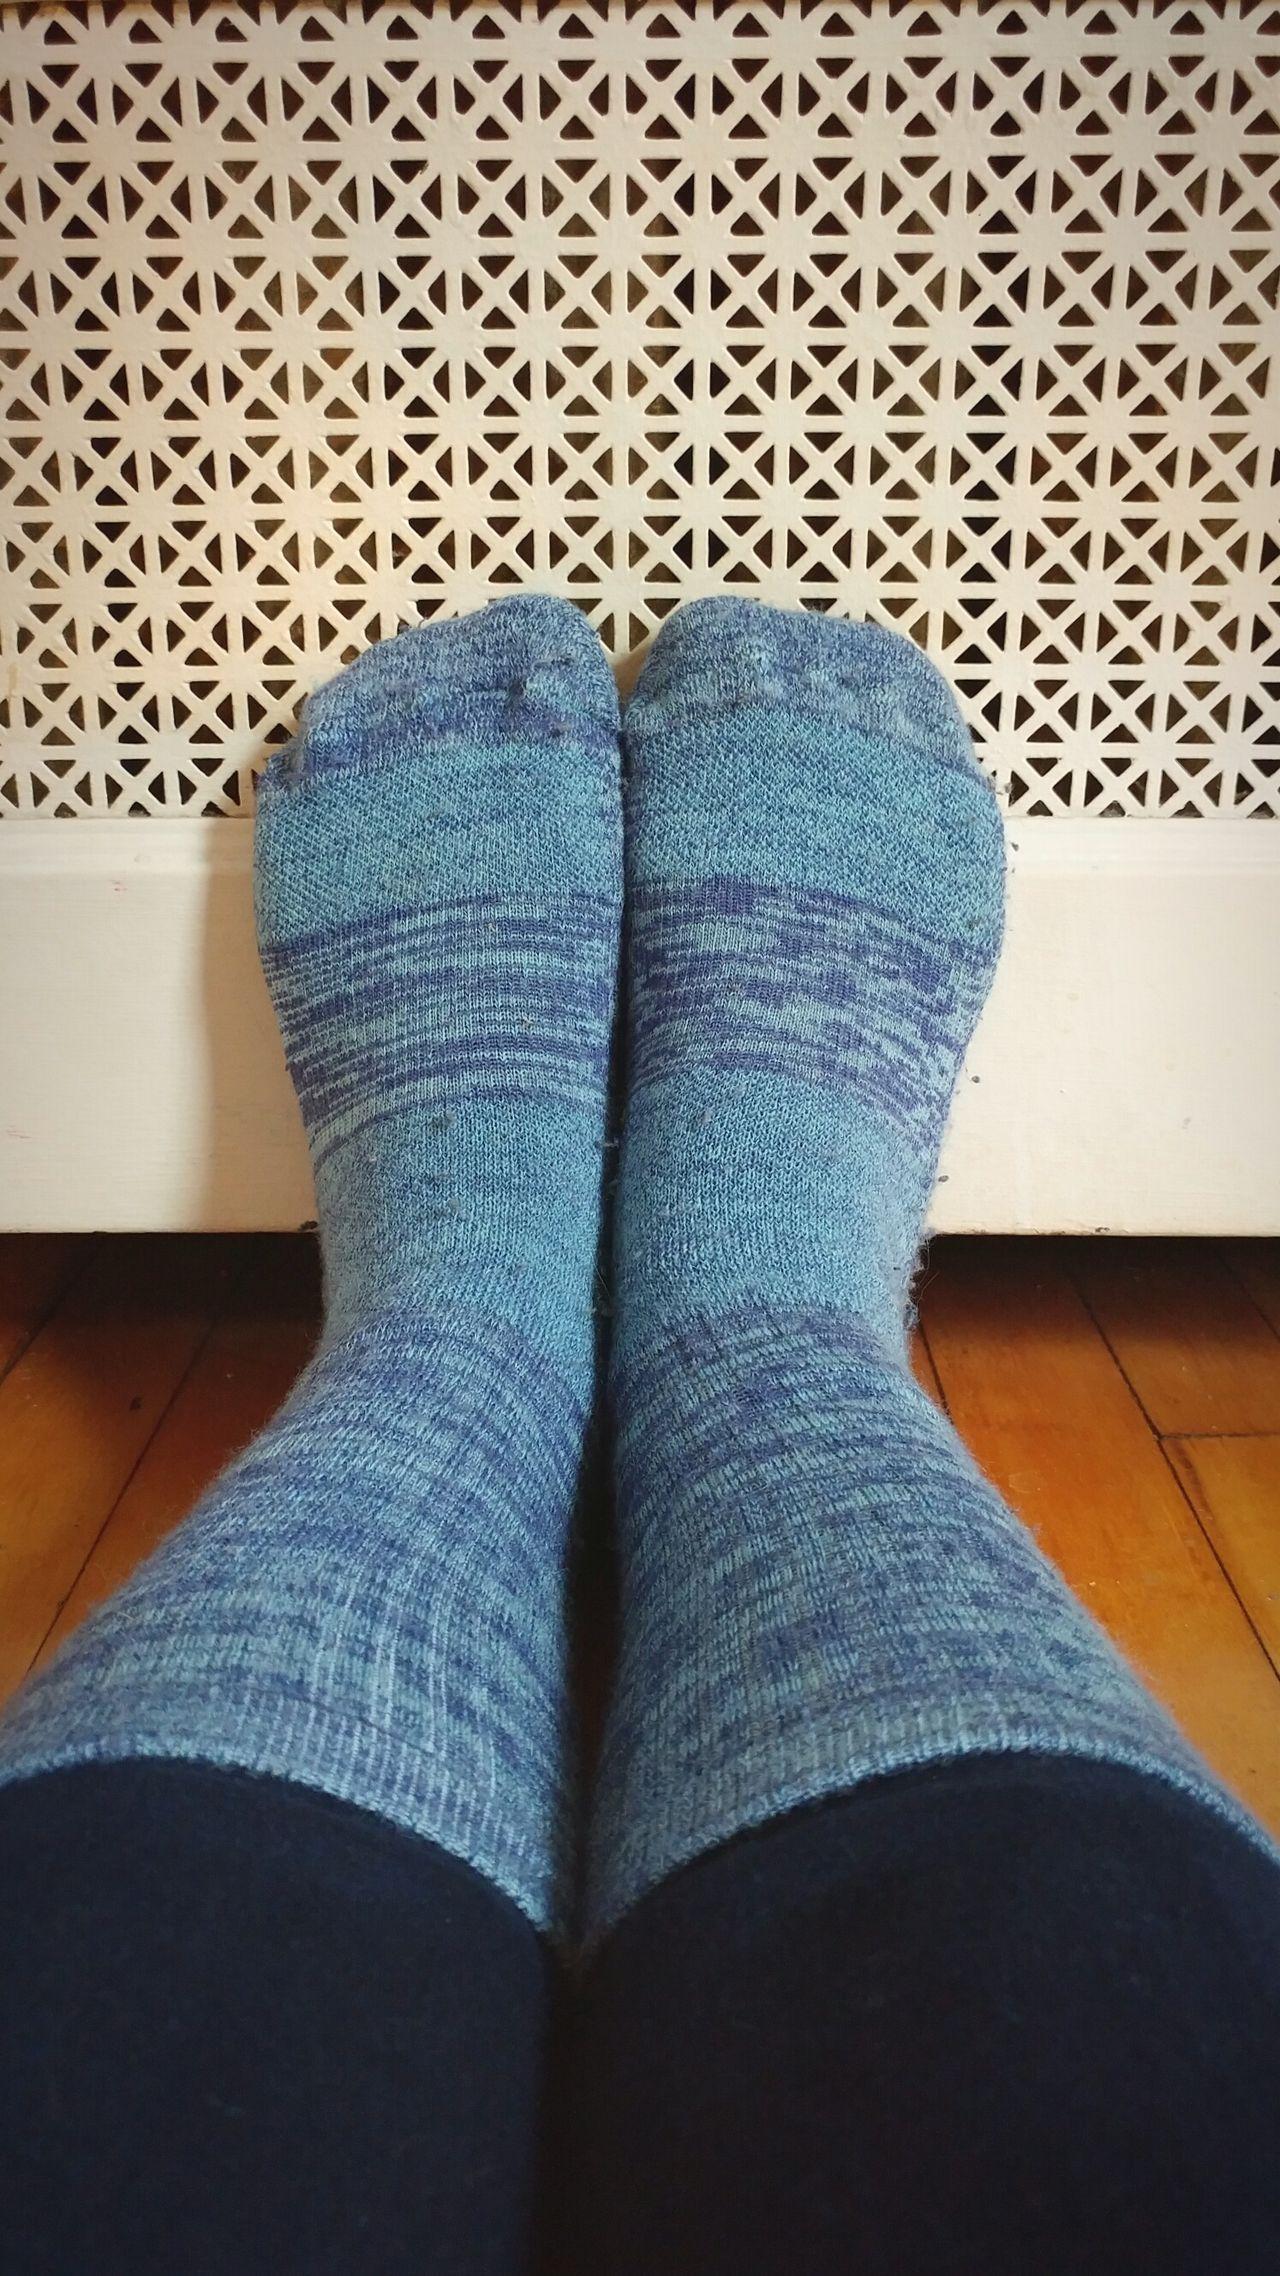 TK Maxx Socksie Socks Socksoftheday Patterns Patterns & Textures Human Leg Indoors  Close-up People Woolsocks Warmth Winterwear Winter Fashion Socksie